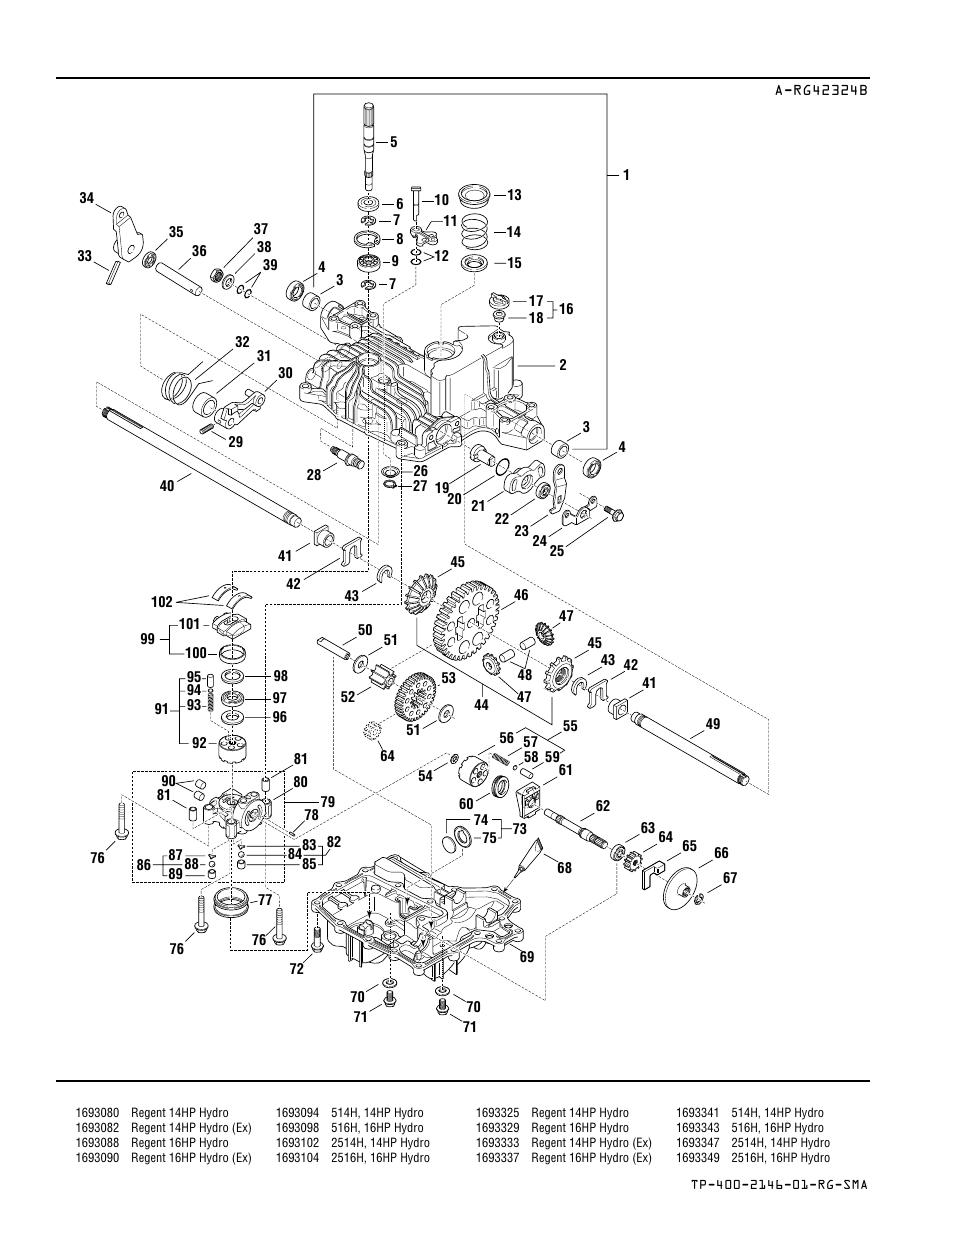 Simplicity REGENT 500 User Manual | Page 24 / 60 | Original mode